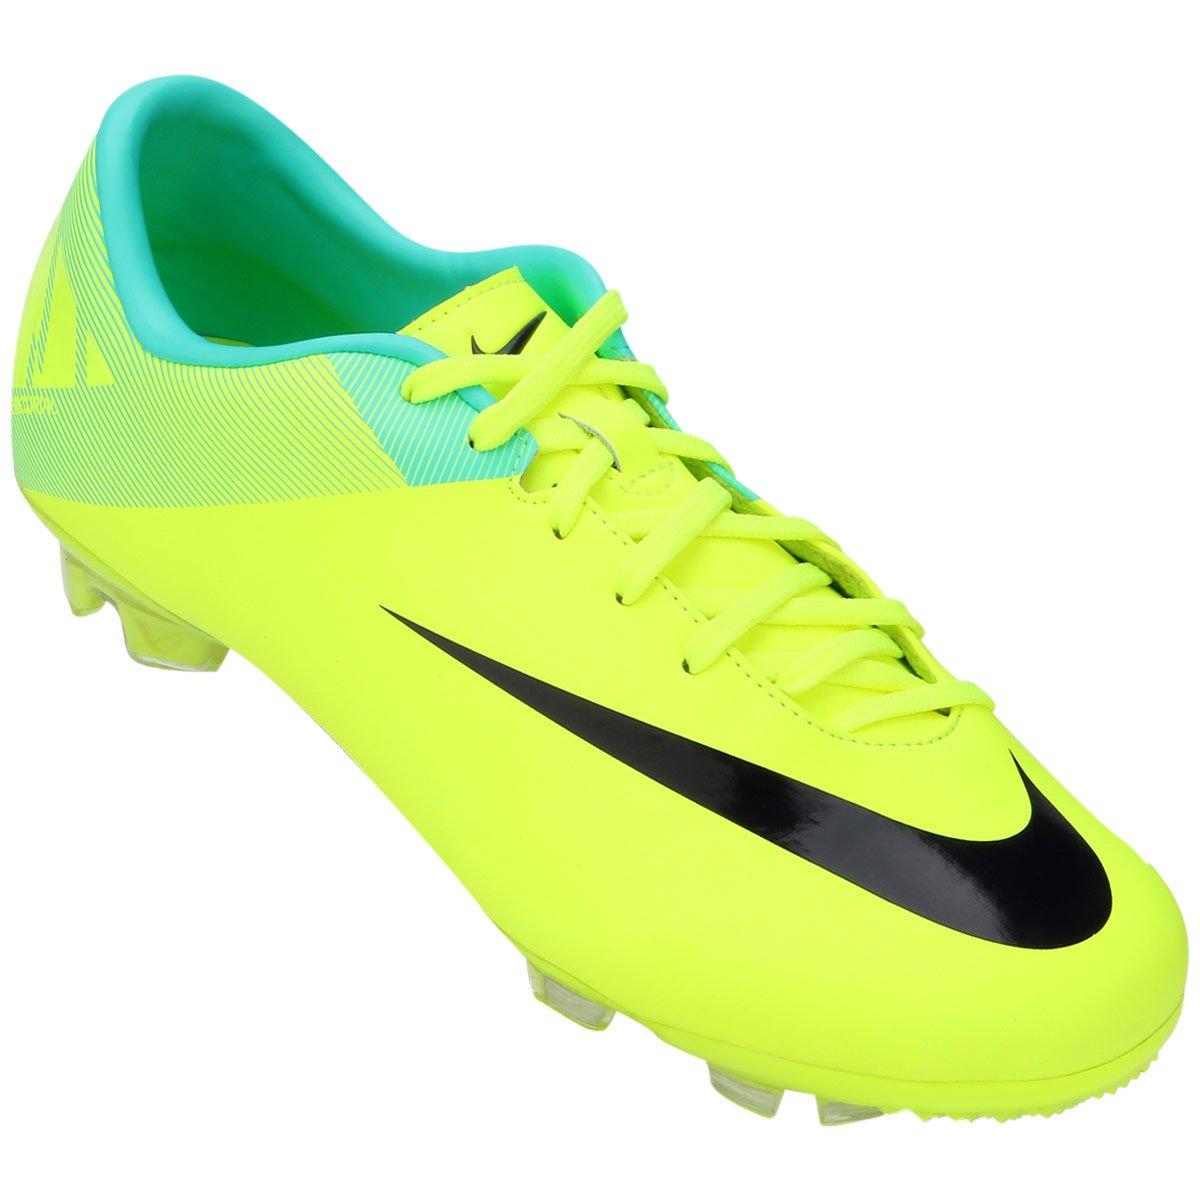 984dd3a094 Chuteira Nike Mercurial Miracle 2 FG - Compre Agora